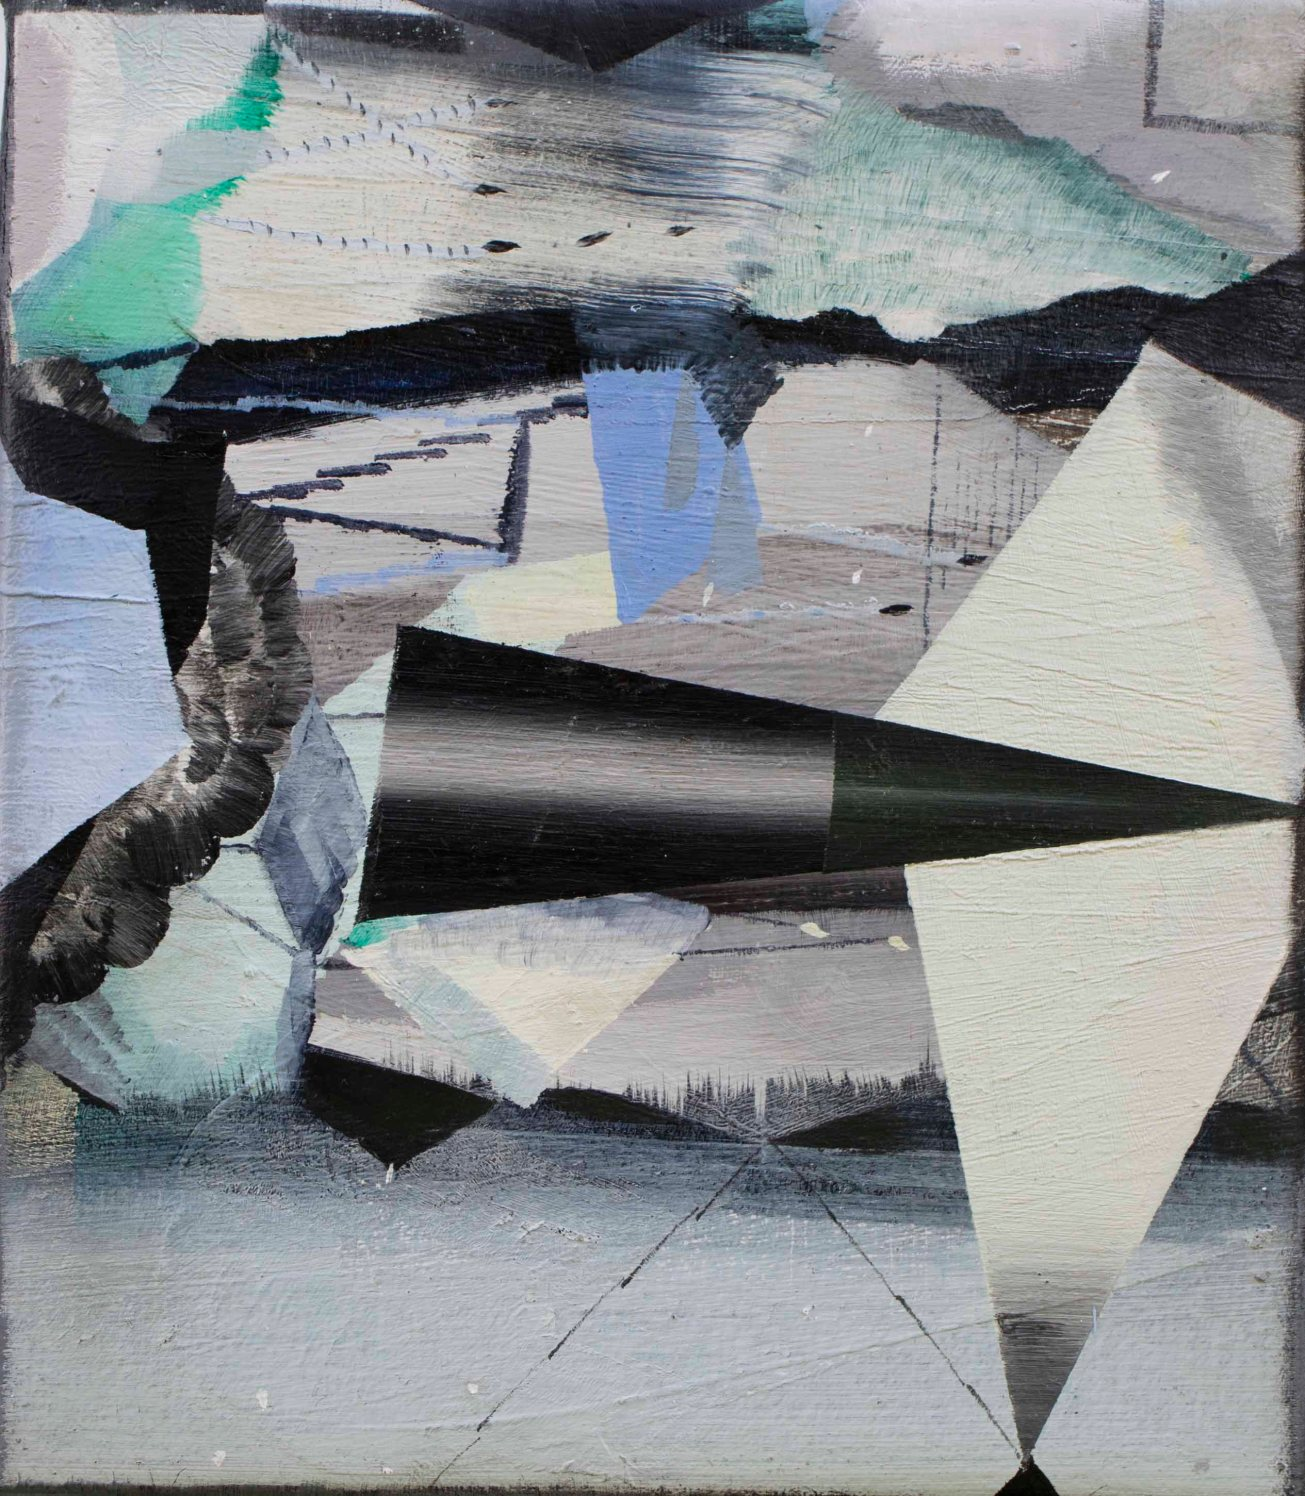 Emma Smith, As if through a crystal visor. 2220 x 190mm, Oil on canvas 2018